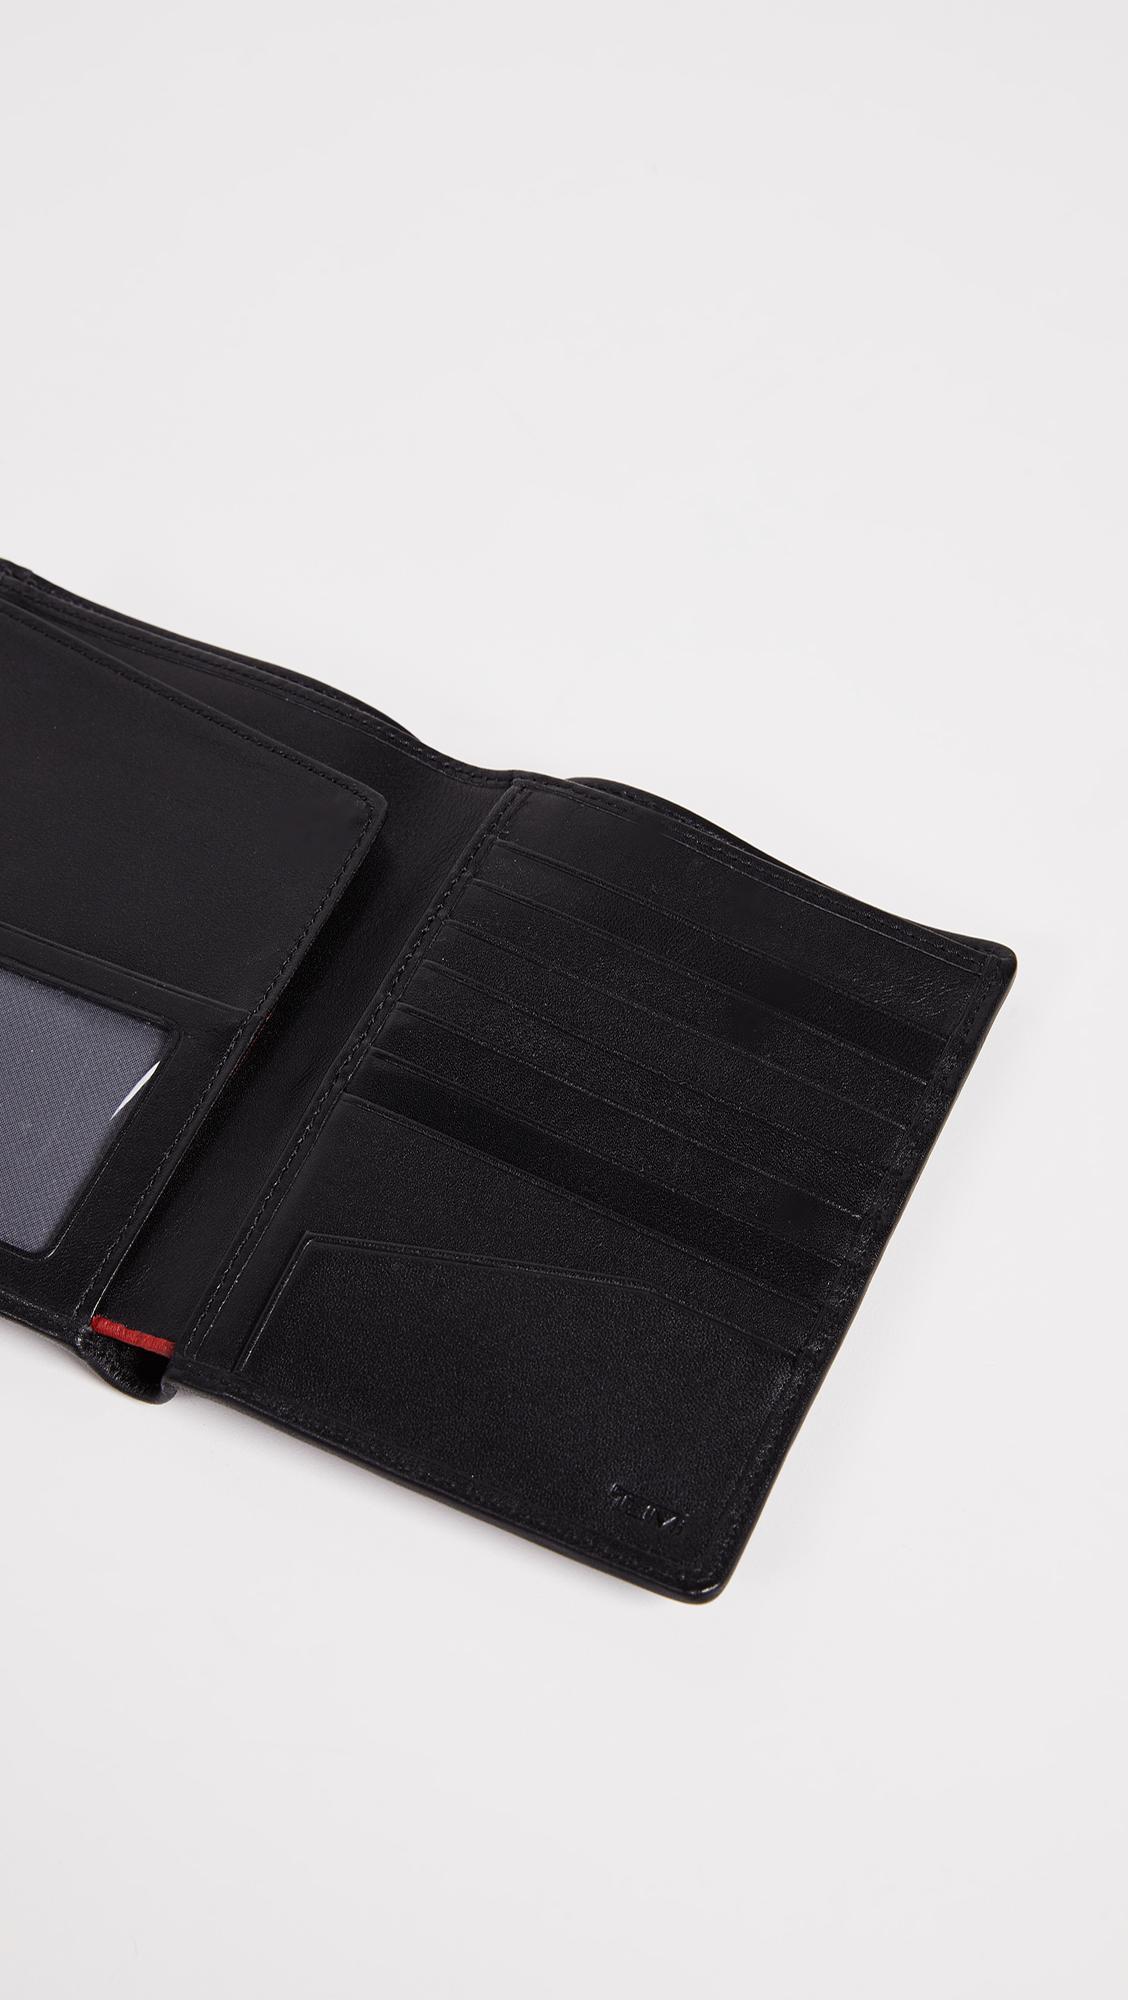 Tumi Alpha Passport Case